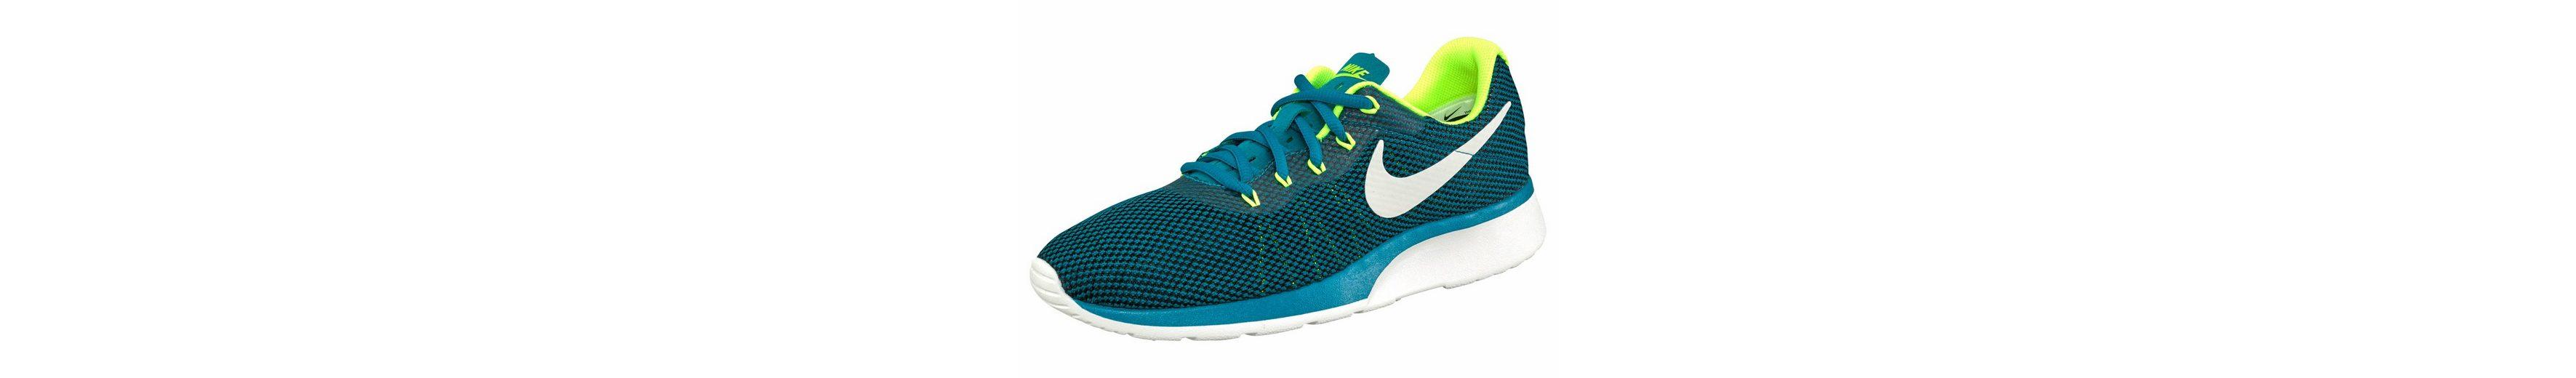 Nike Sportswear Tanjun Racer Sneaker Verkauf Nicekicks 3NJabT